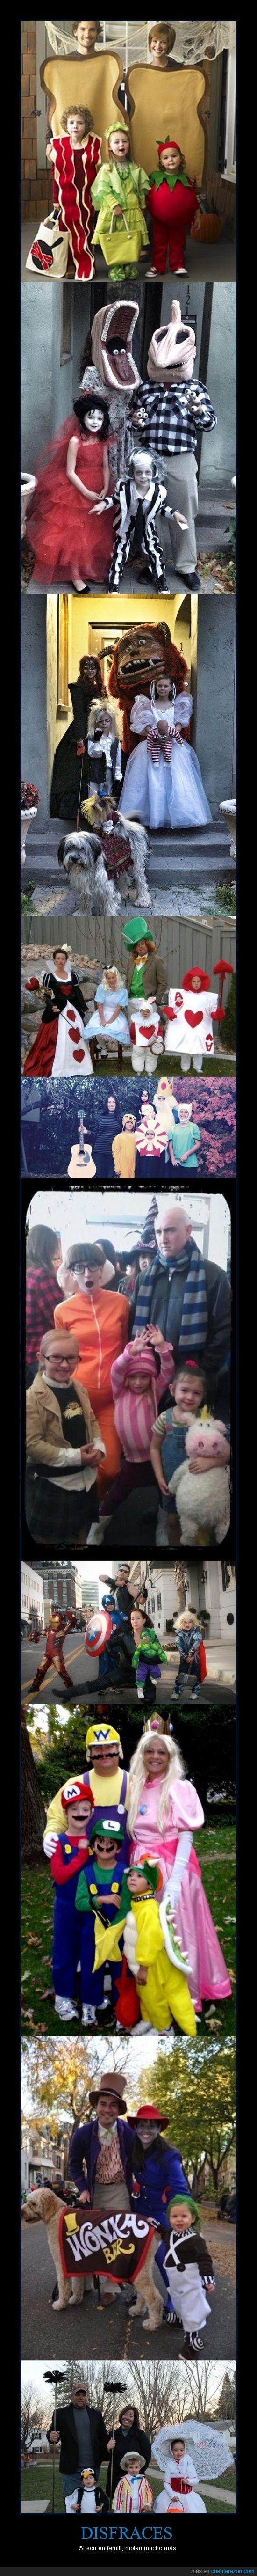 disfraz,familia,halloween,series,superheroes